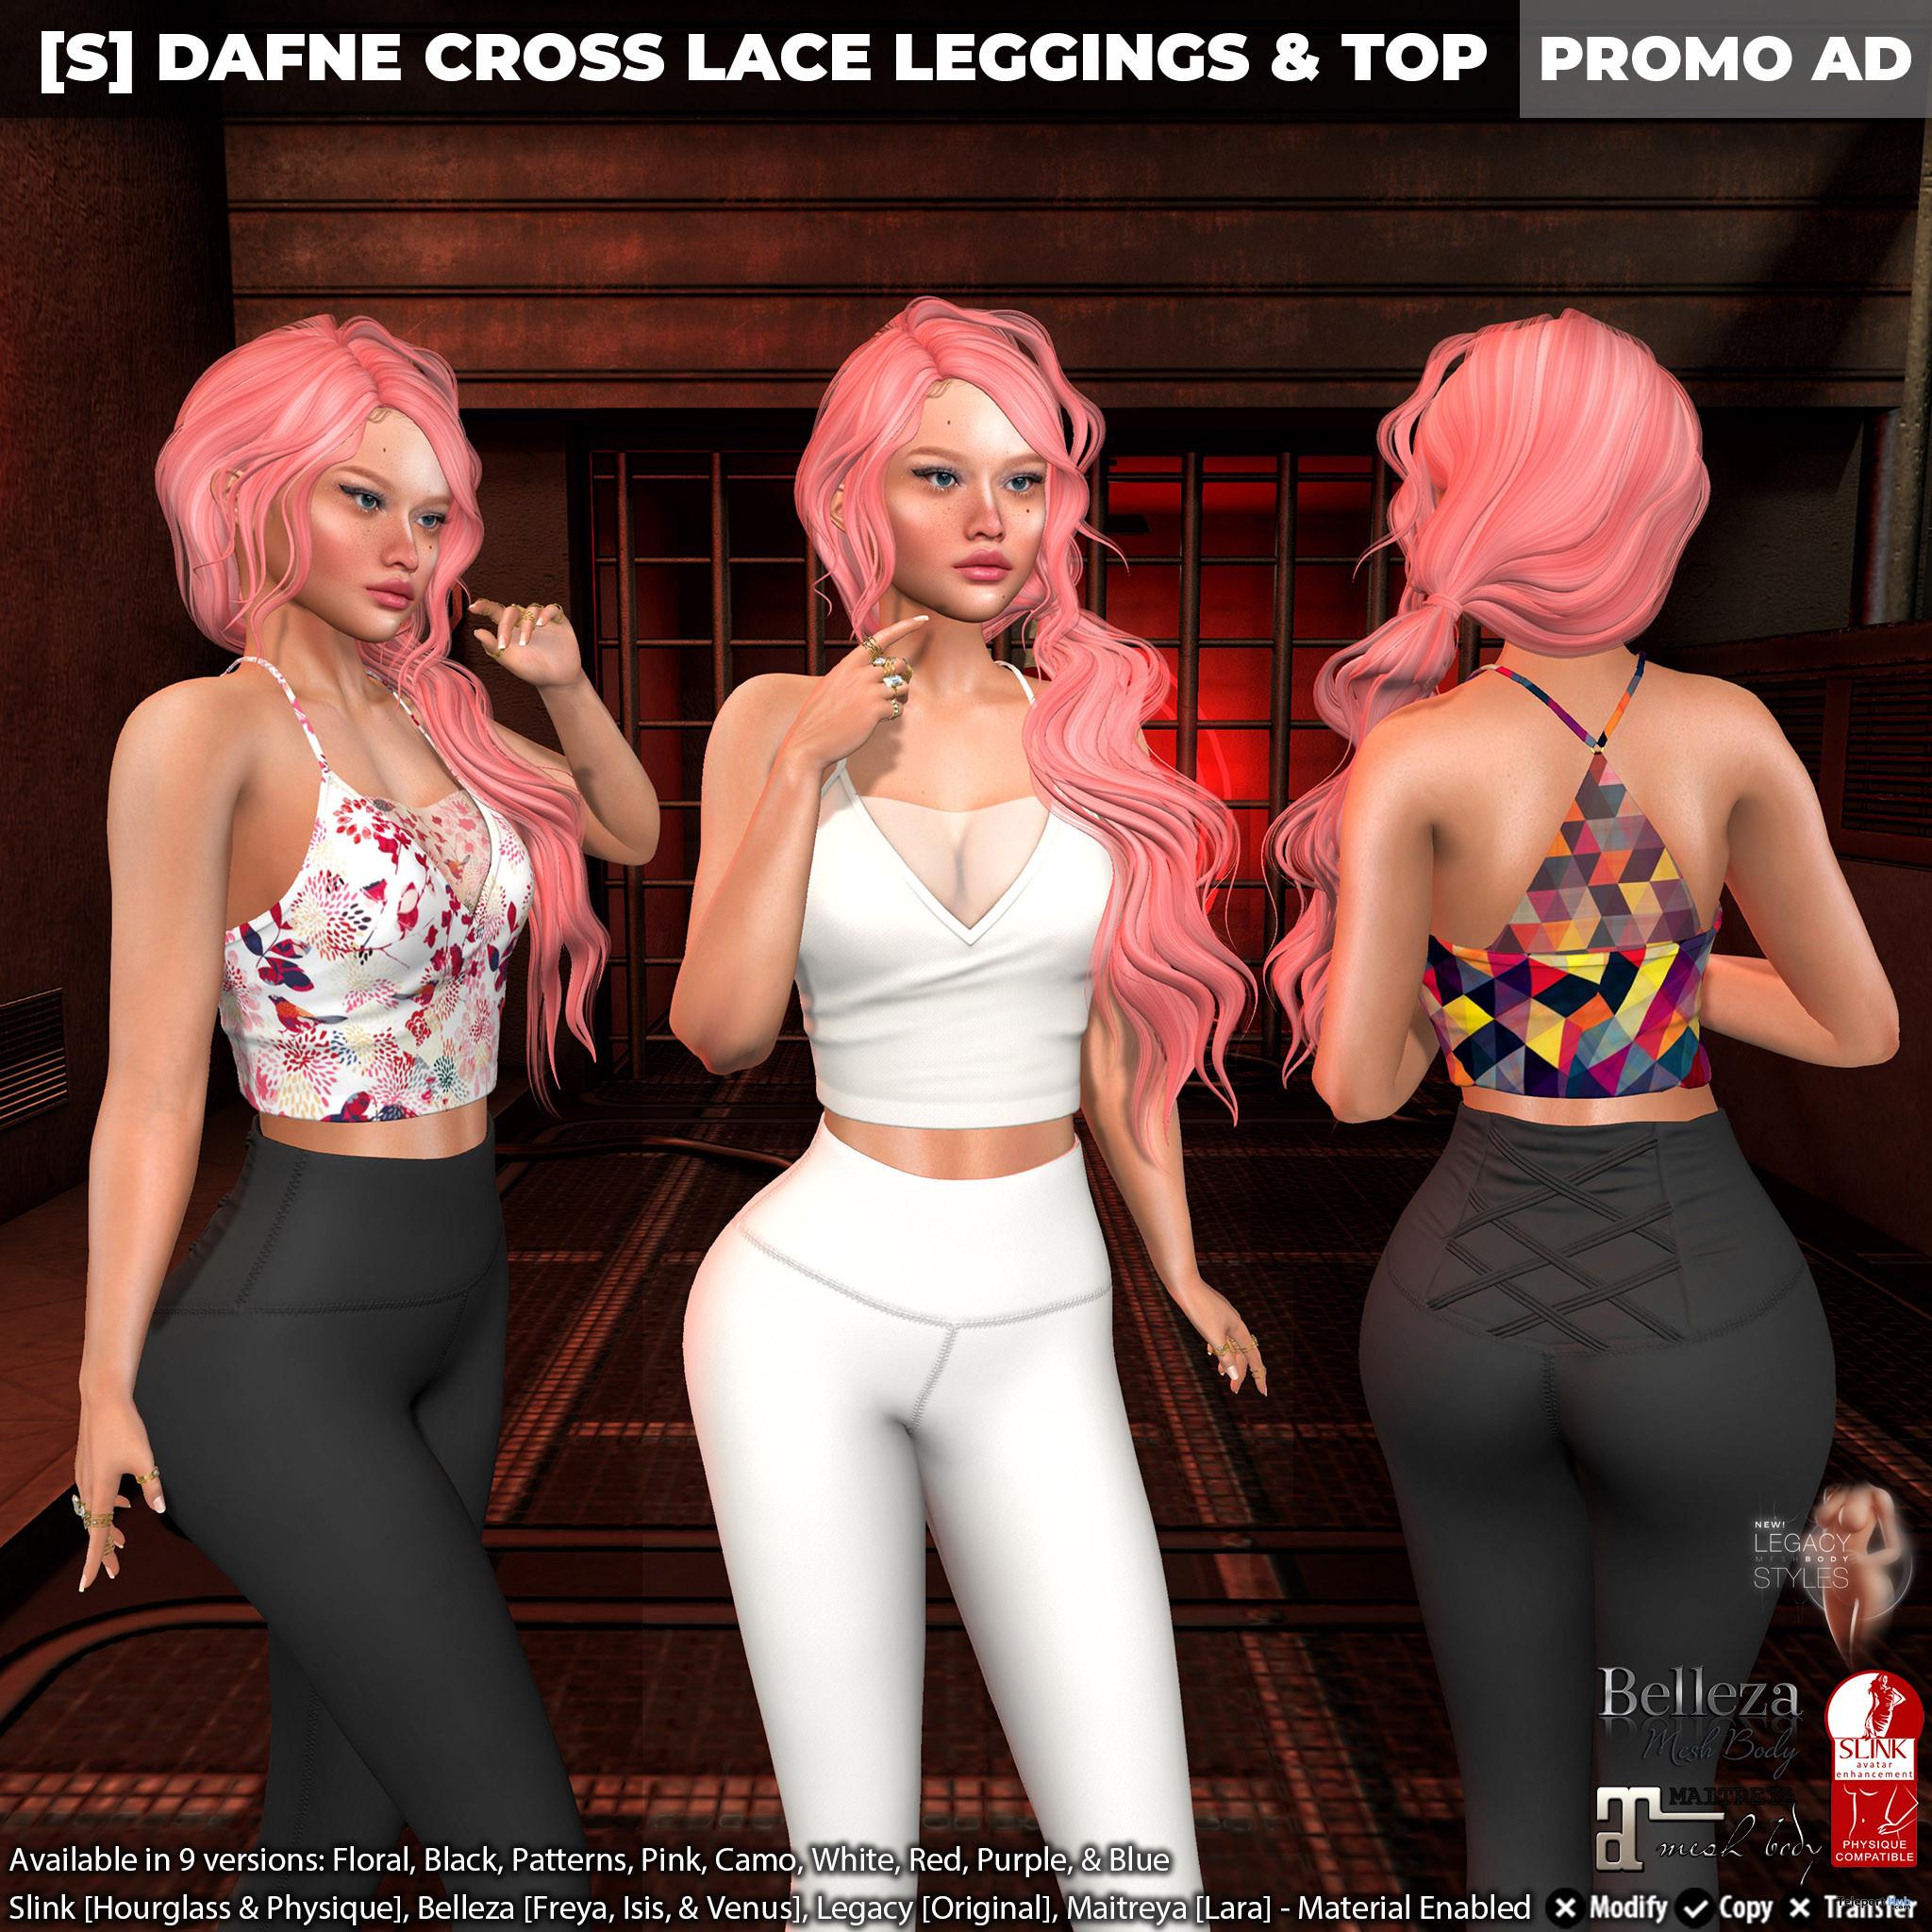 New Release: [S] Dafne Cross Lace Leggings & Top by [satus Inc] - Teleport Hub - teleporthub.com